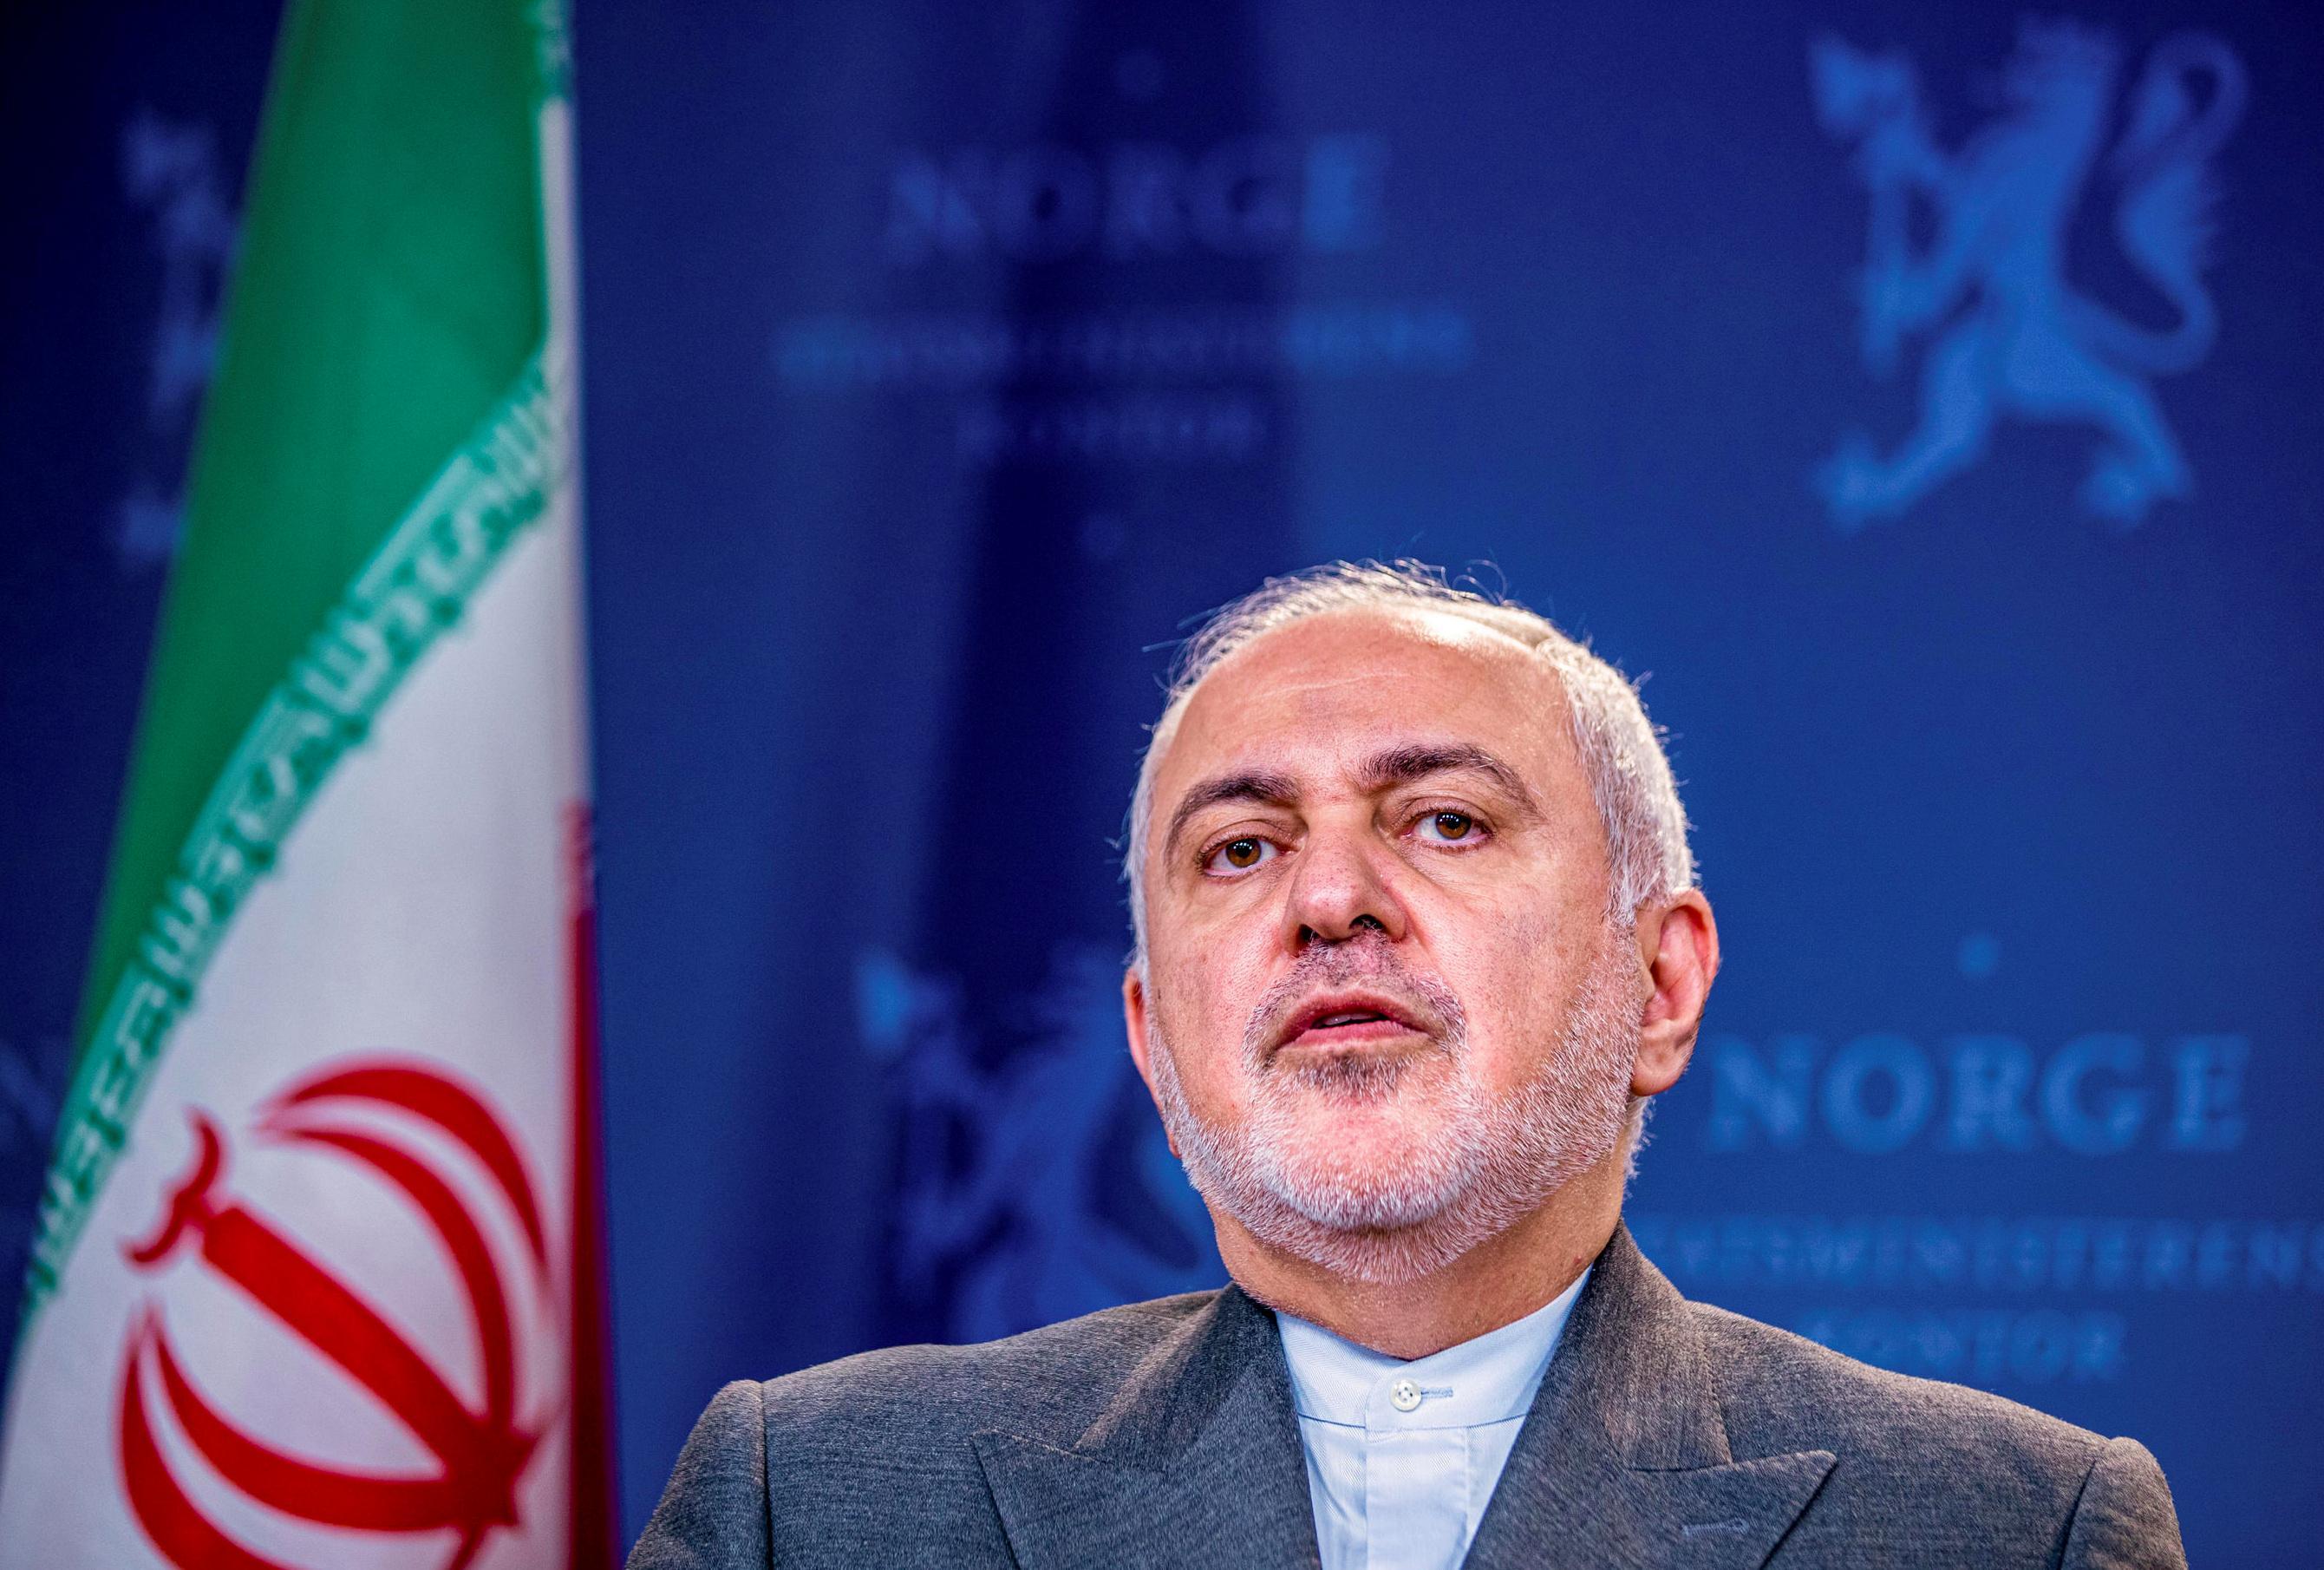 Trump caught off guard as Iran's Zarif lands in G7 summit town